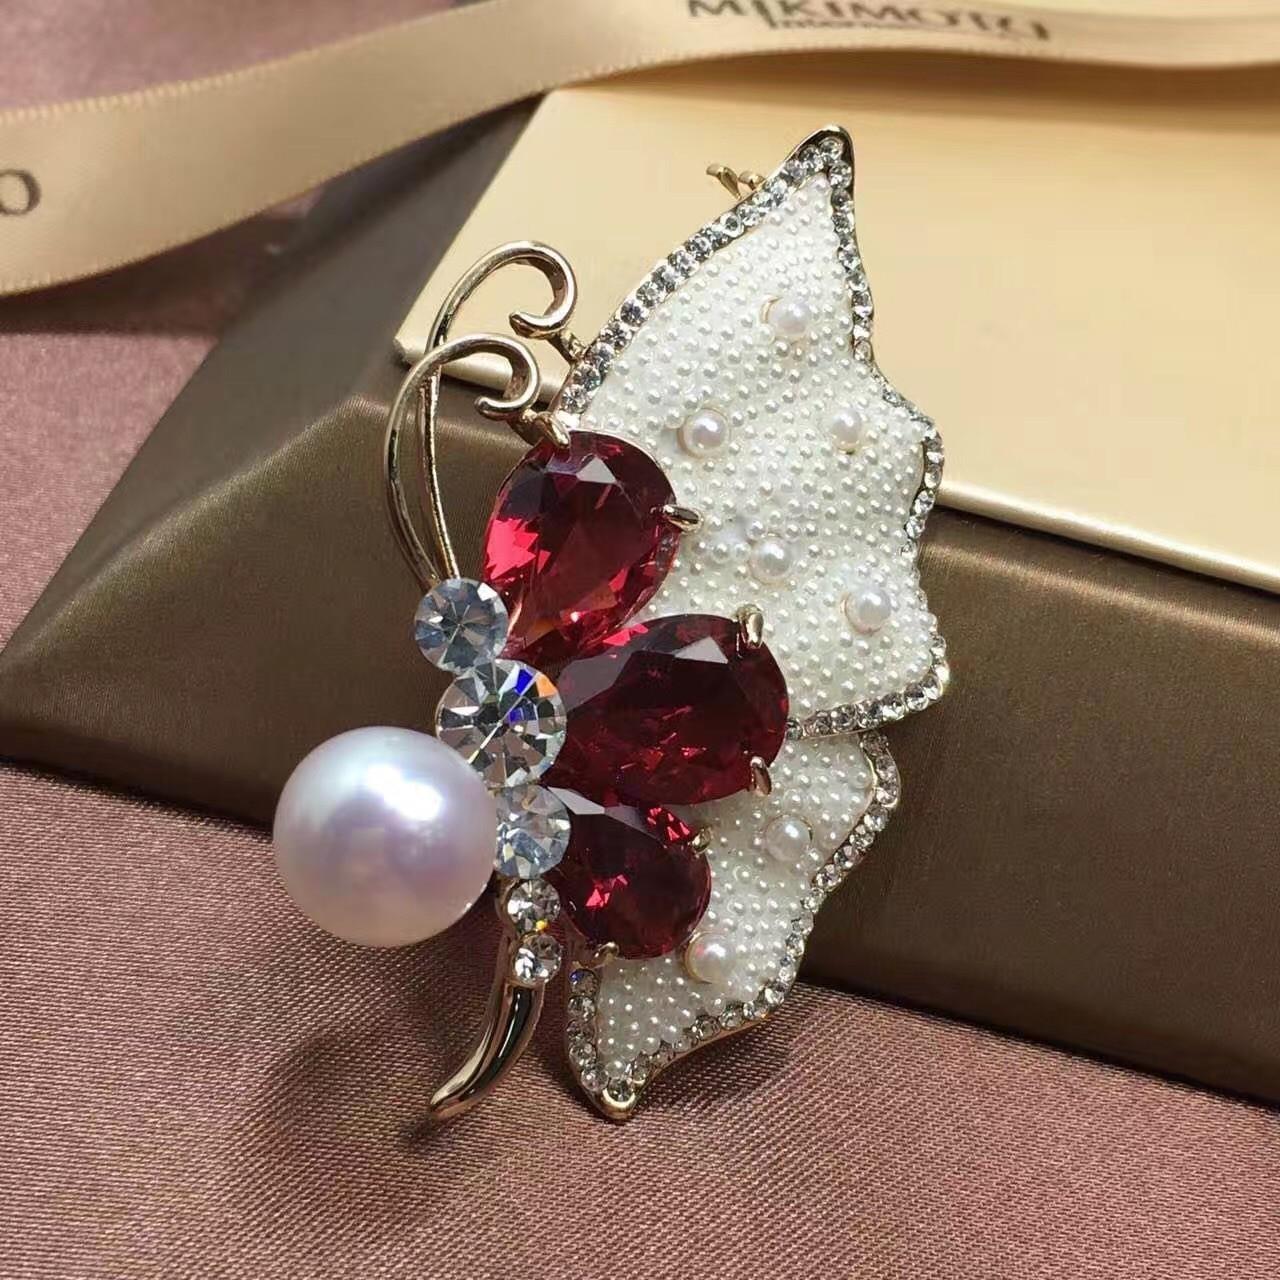 Pearl jewelry clothing brooch brooch 12-13MM freshwater pearl jewelry pearl brooch.